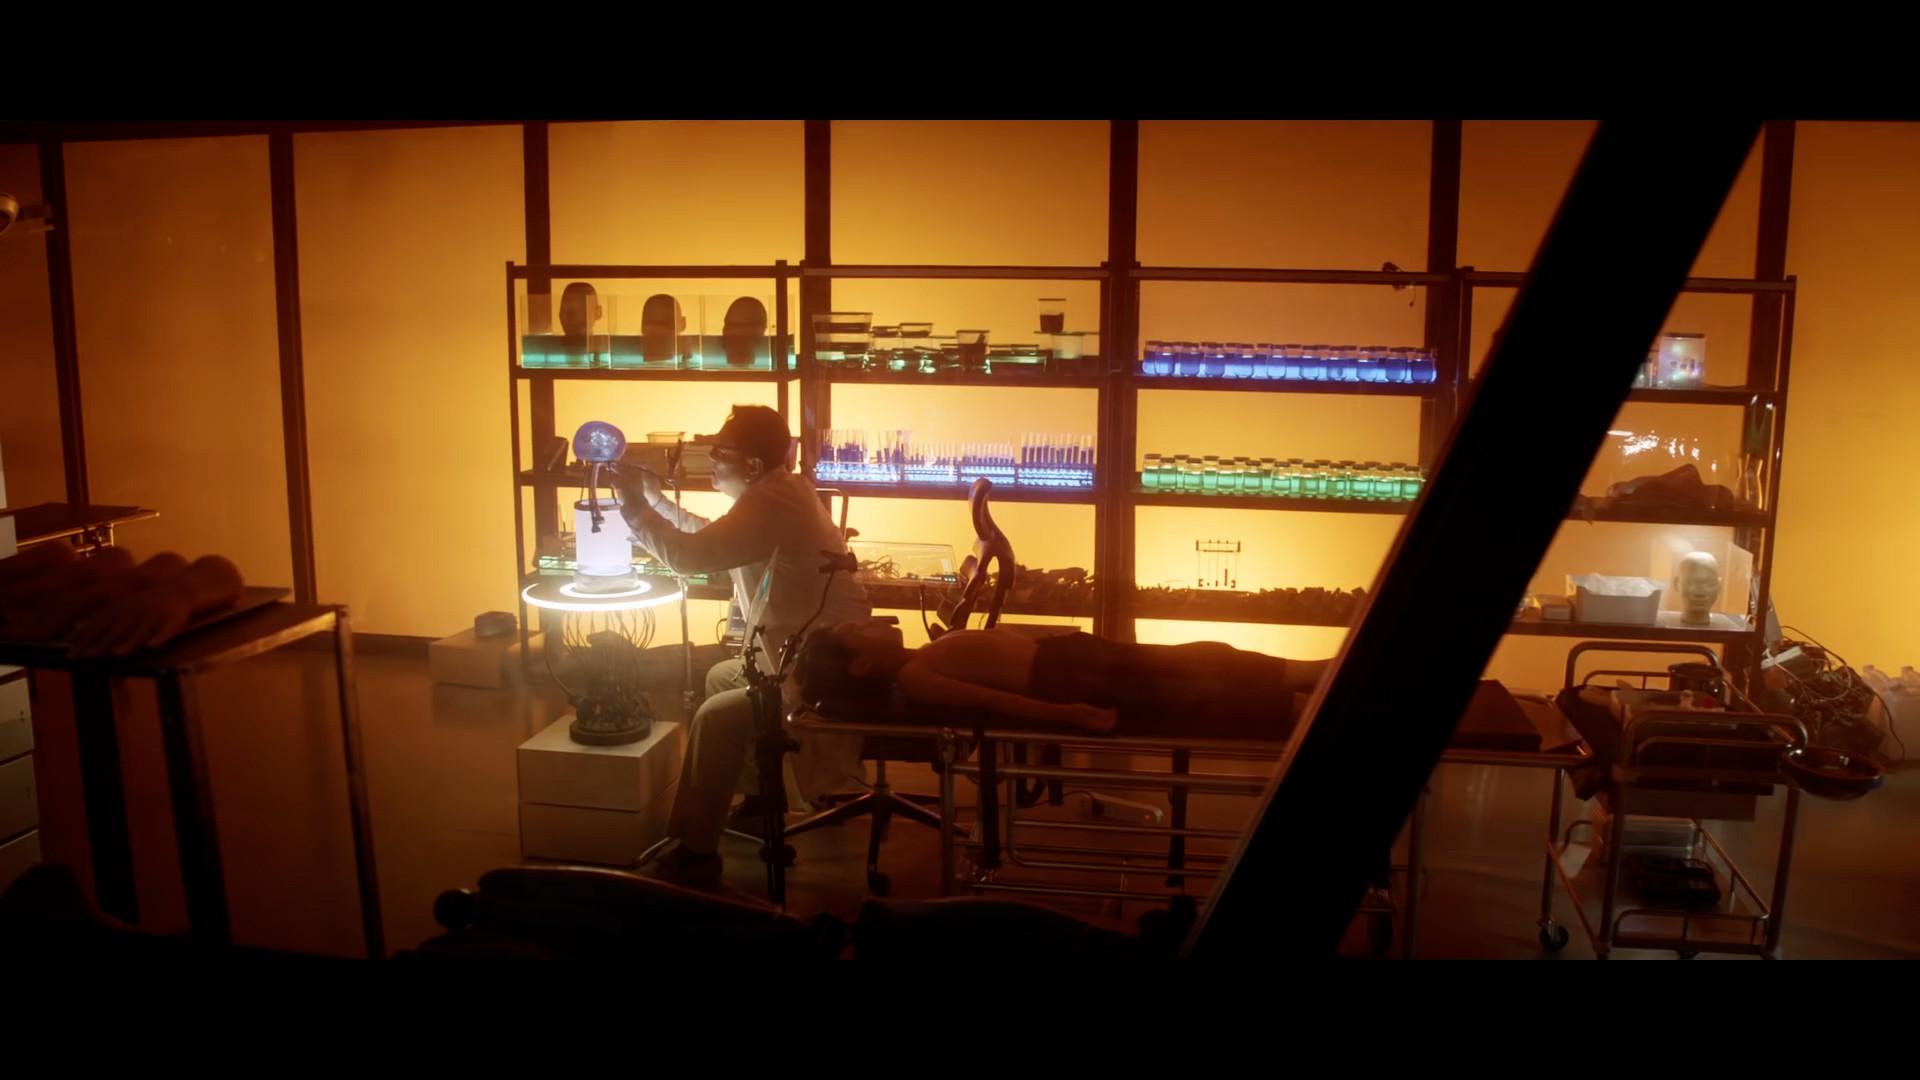 Int. David Elster's Laboratory